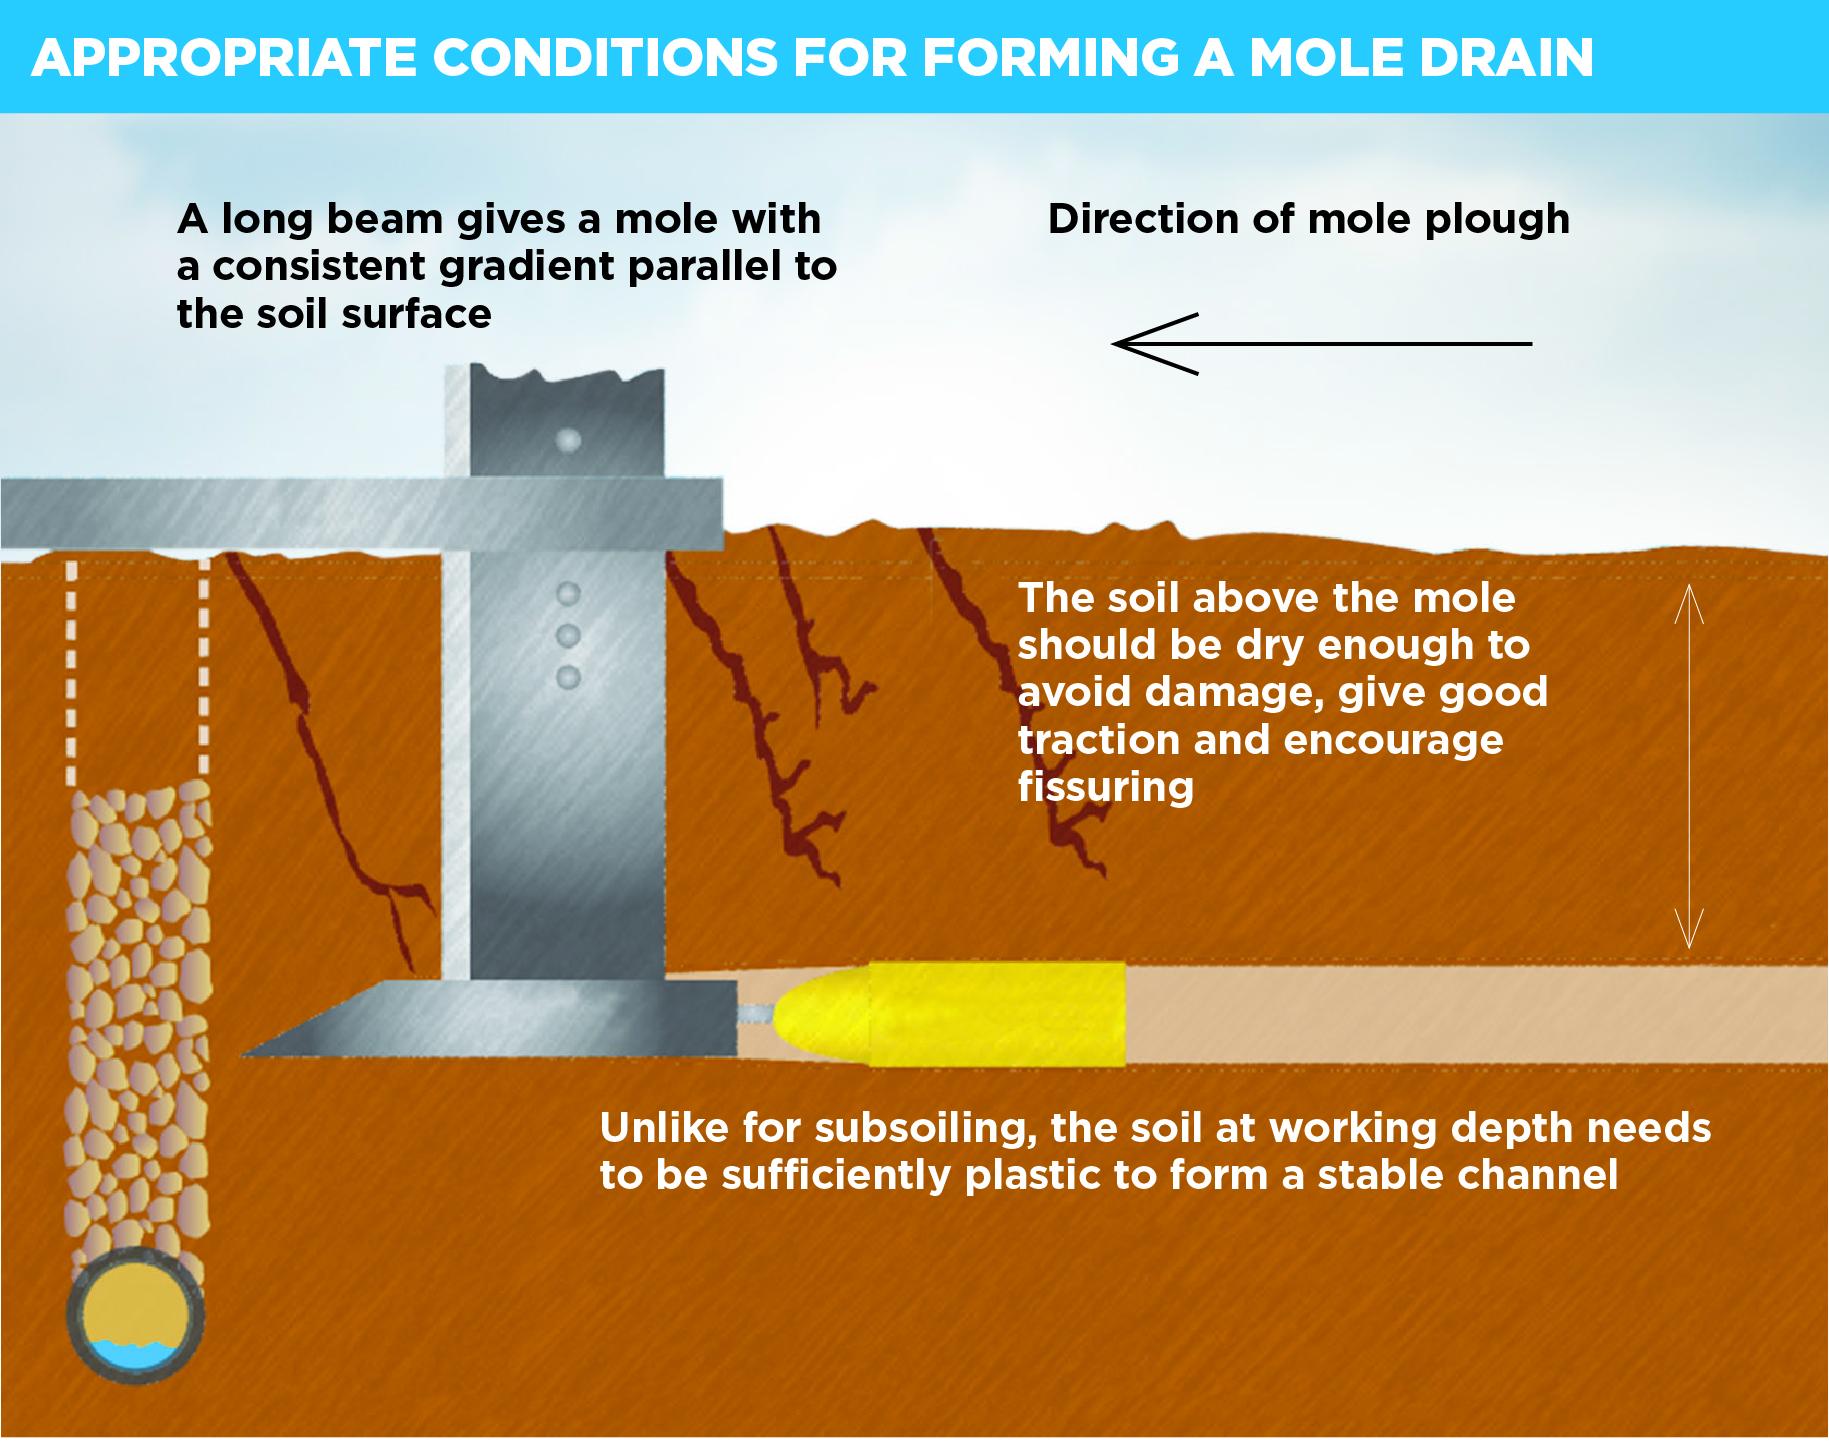 An illustration showing a mole drain